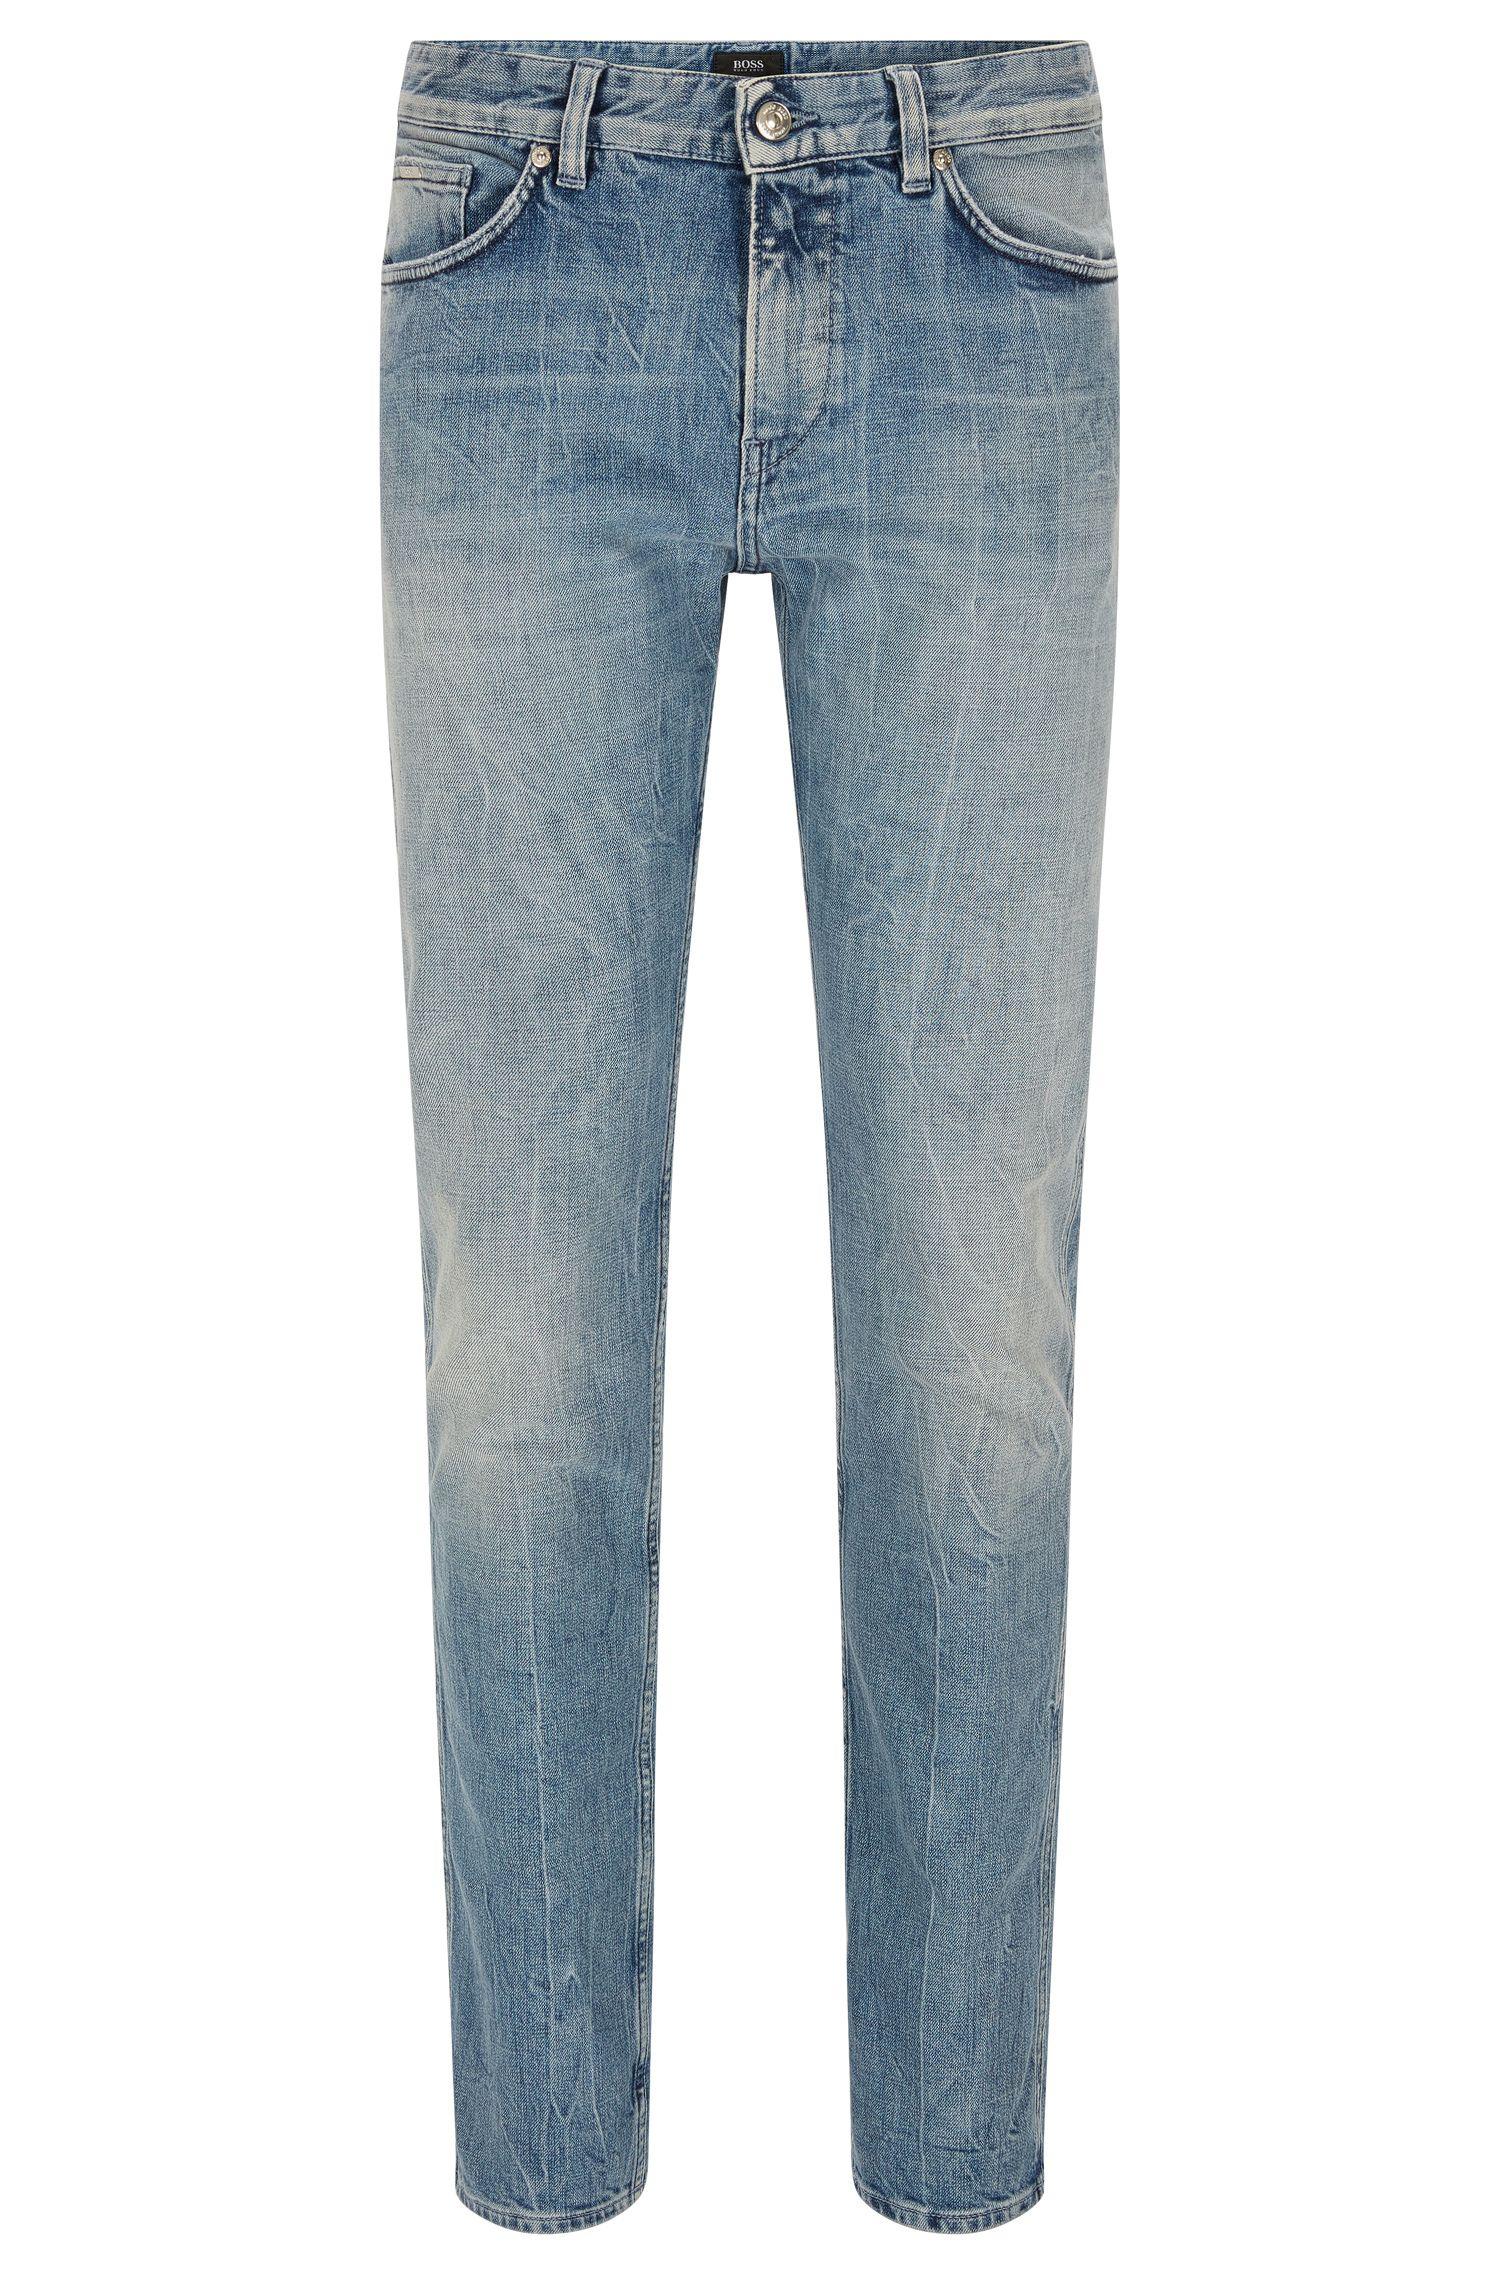 12 oz Stretch Cotton Jeans, Slim Fit   Delaware